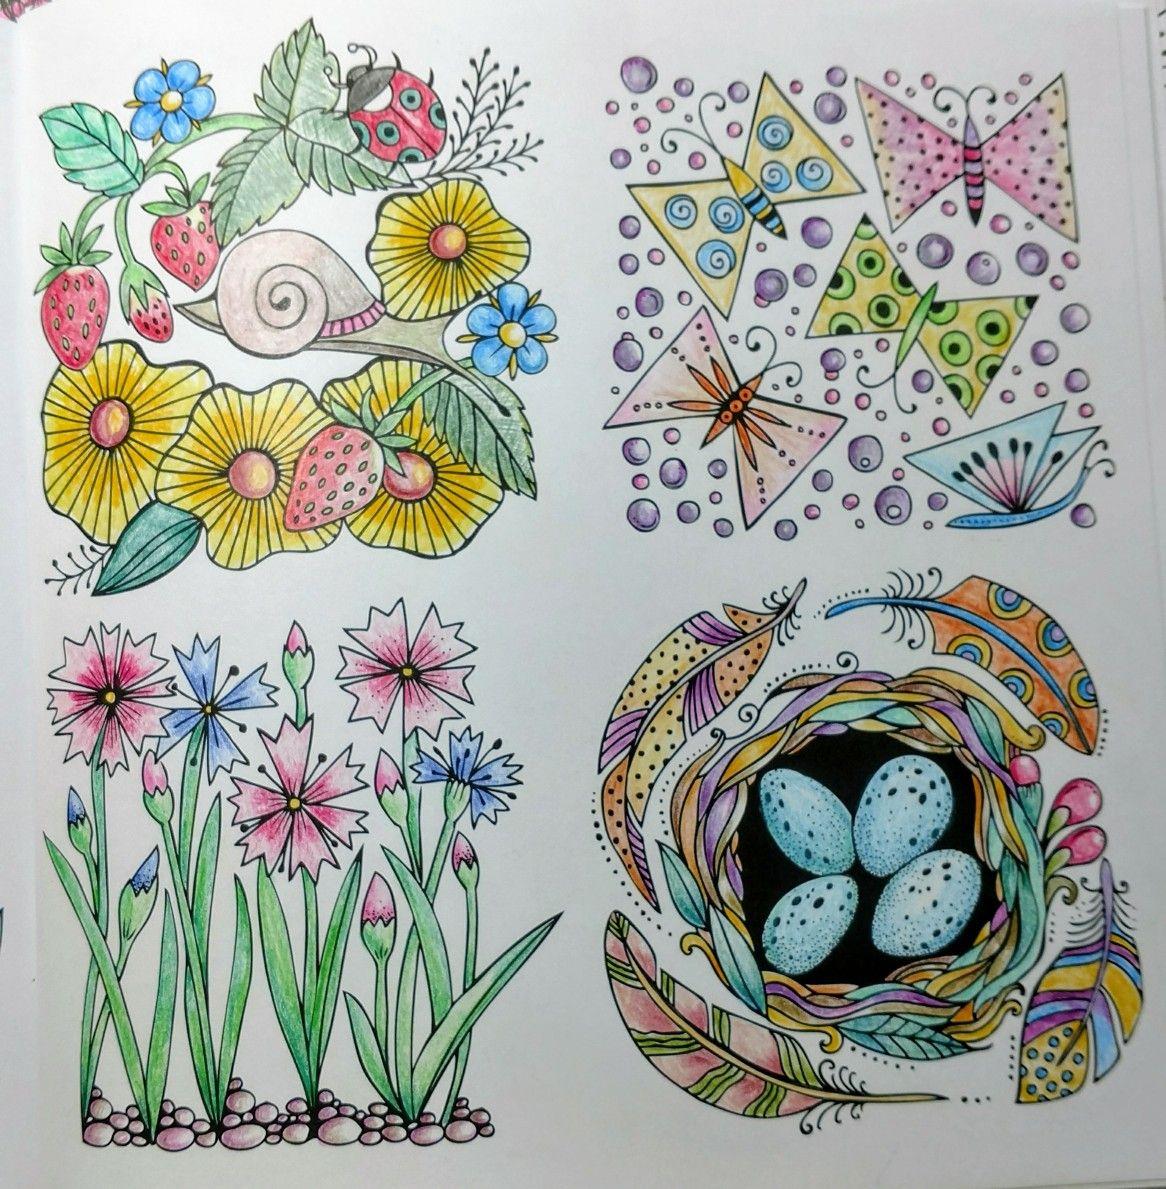 Fruhlings Spazlergang By Rita Berman Colored By Me 4 26 17 Ausmalen Beautiful